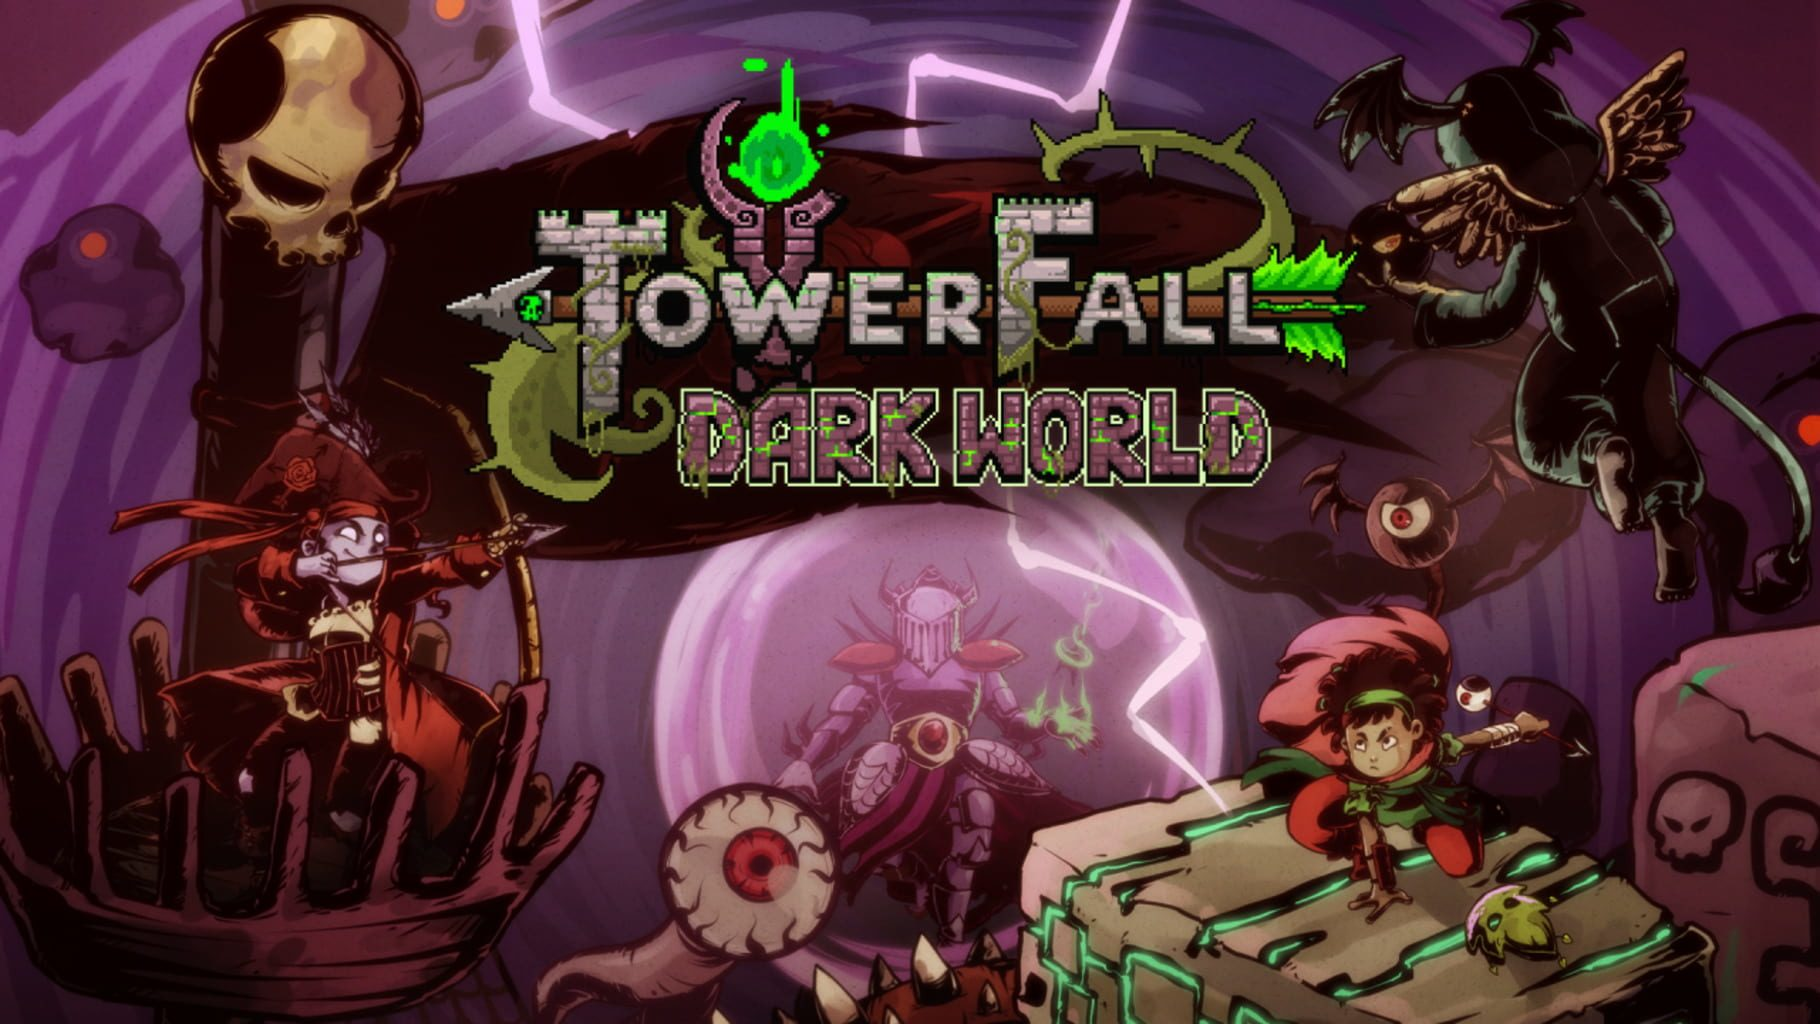 buy Towerfall Ascension: Dark Worlds cd key for all platform